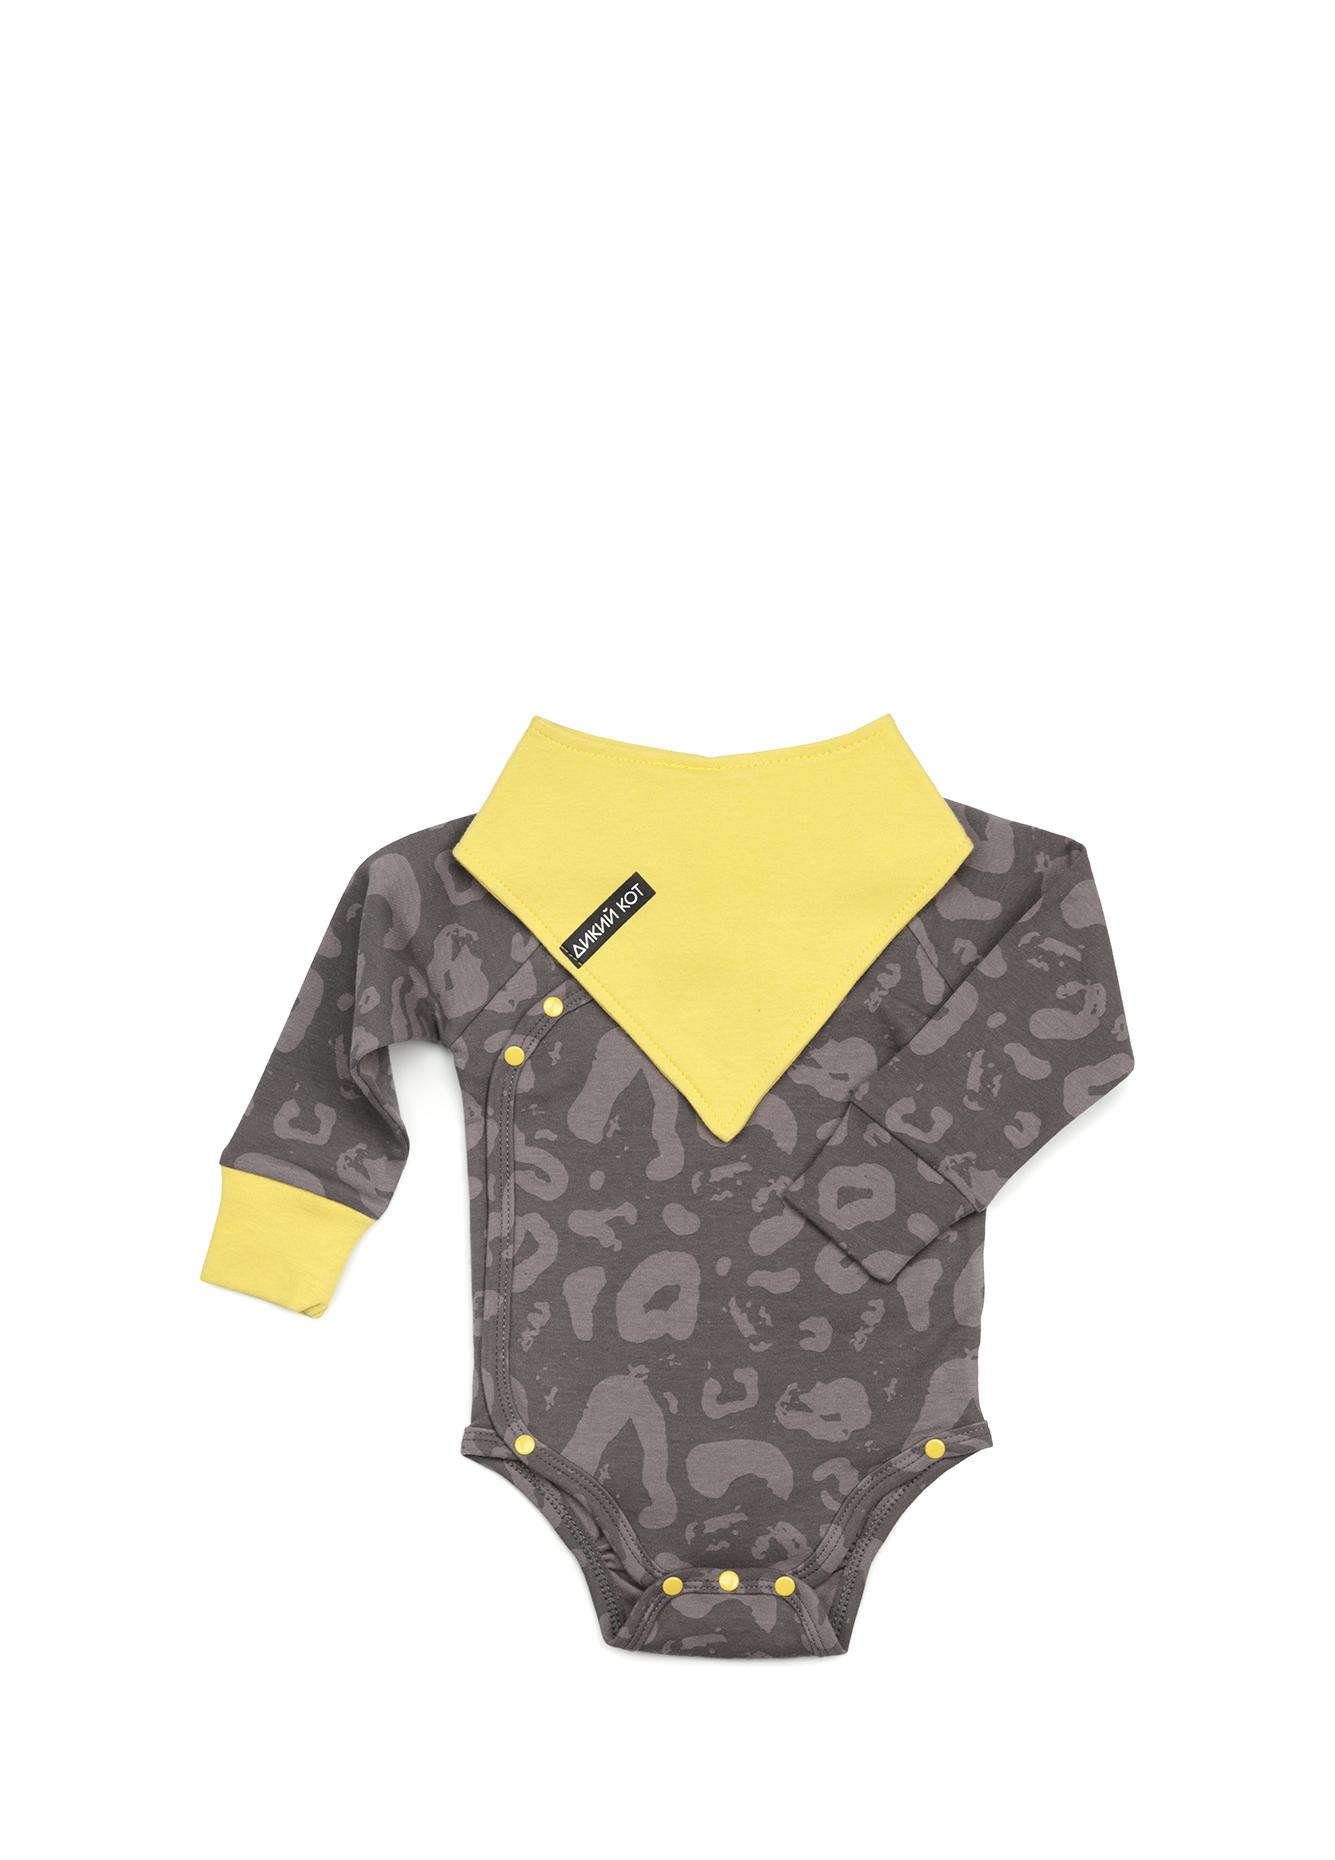 Боди Happy Baby happy baby нагрудный фартук на липучке happy baby birds жёлтый